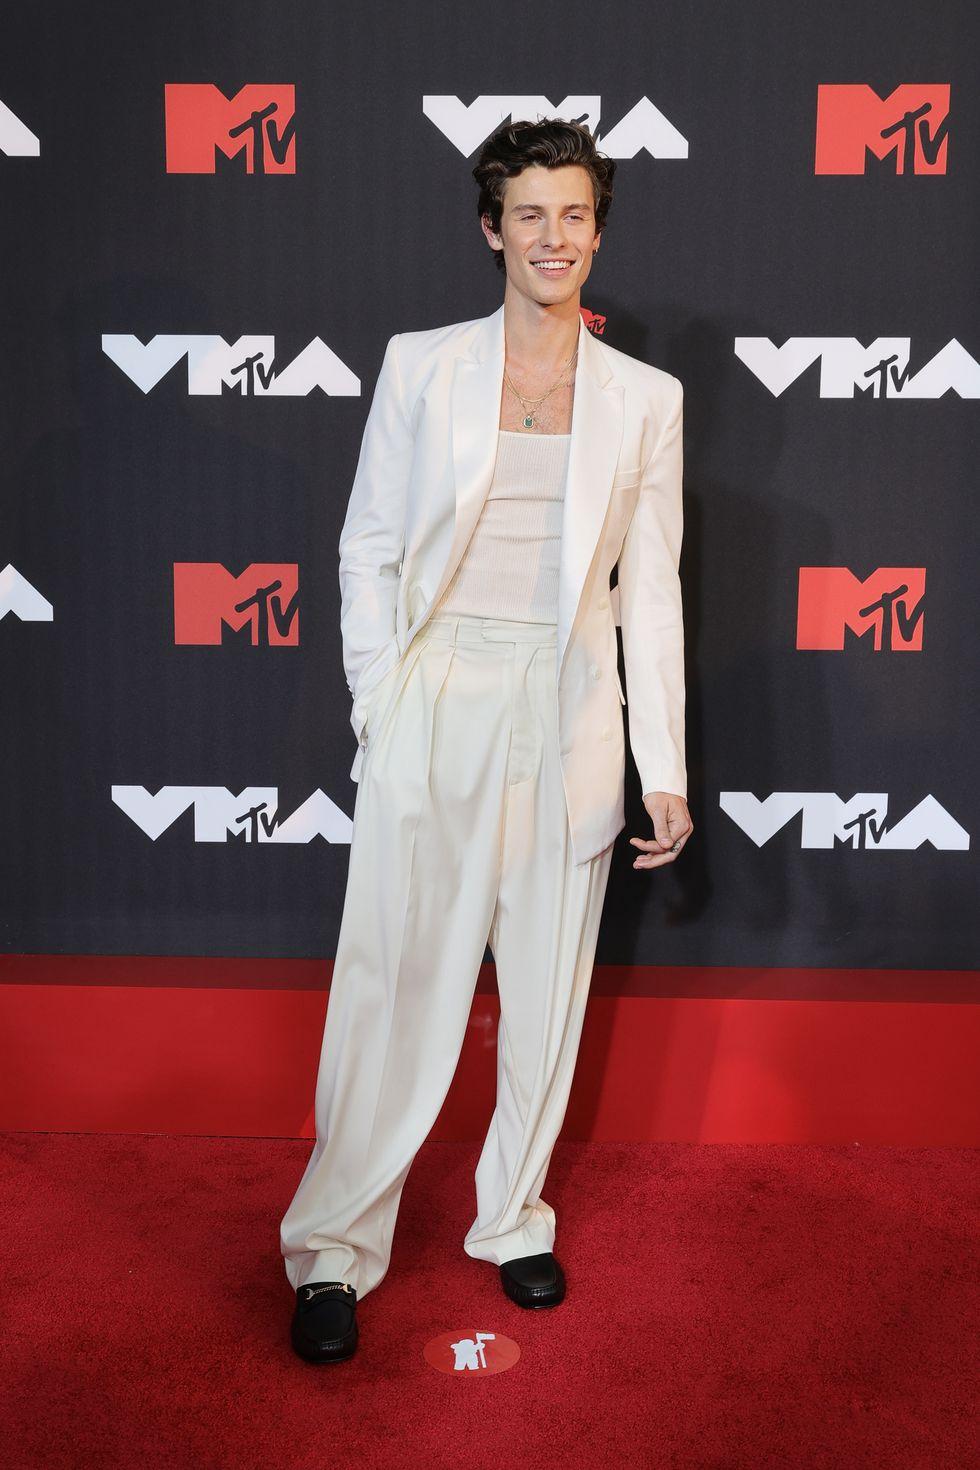 MTV VMAs Shawn Mendes